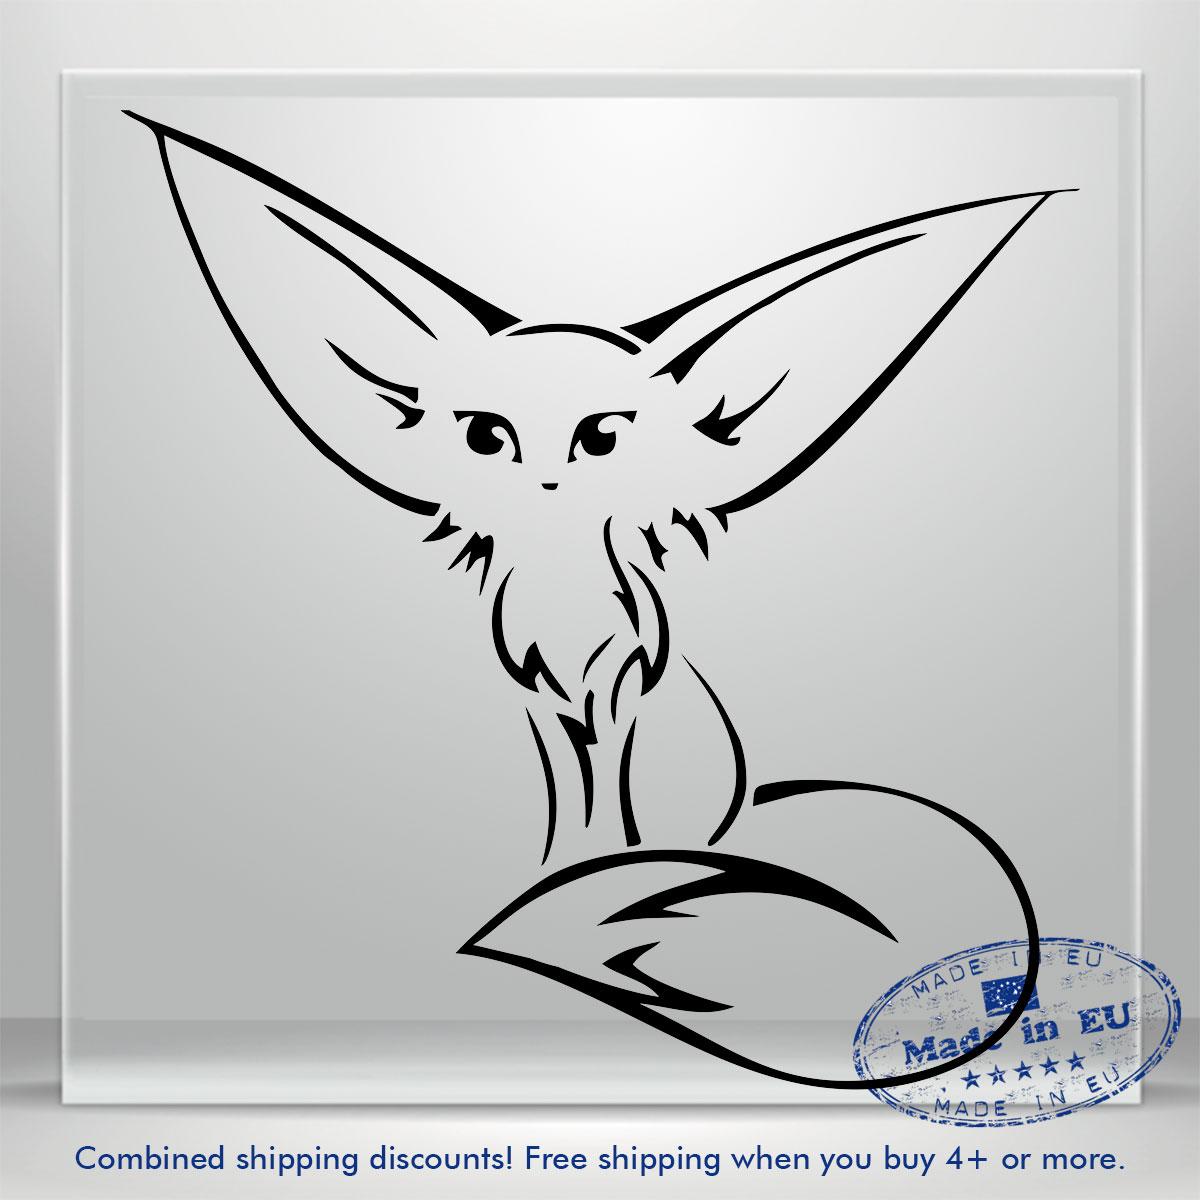 Vinyl Decal Fox Head Silhouette Boats Windows Walls Cars Trucks Lap Tops Ebay